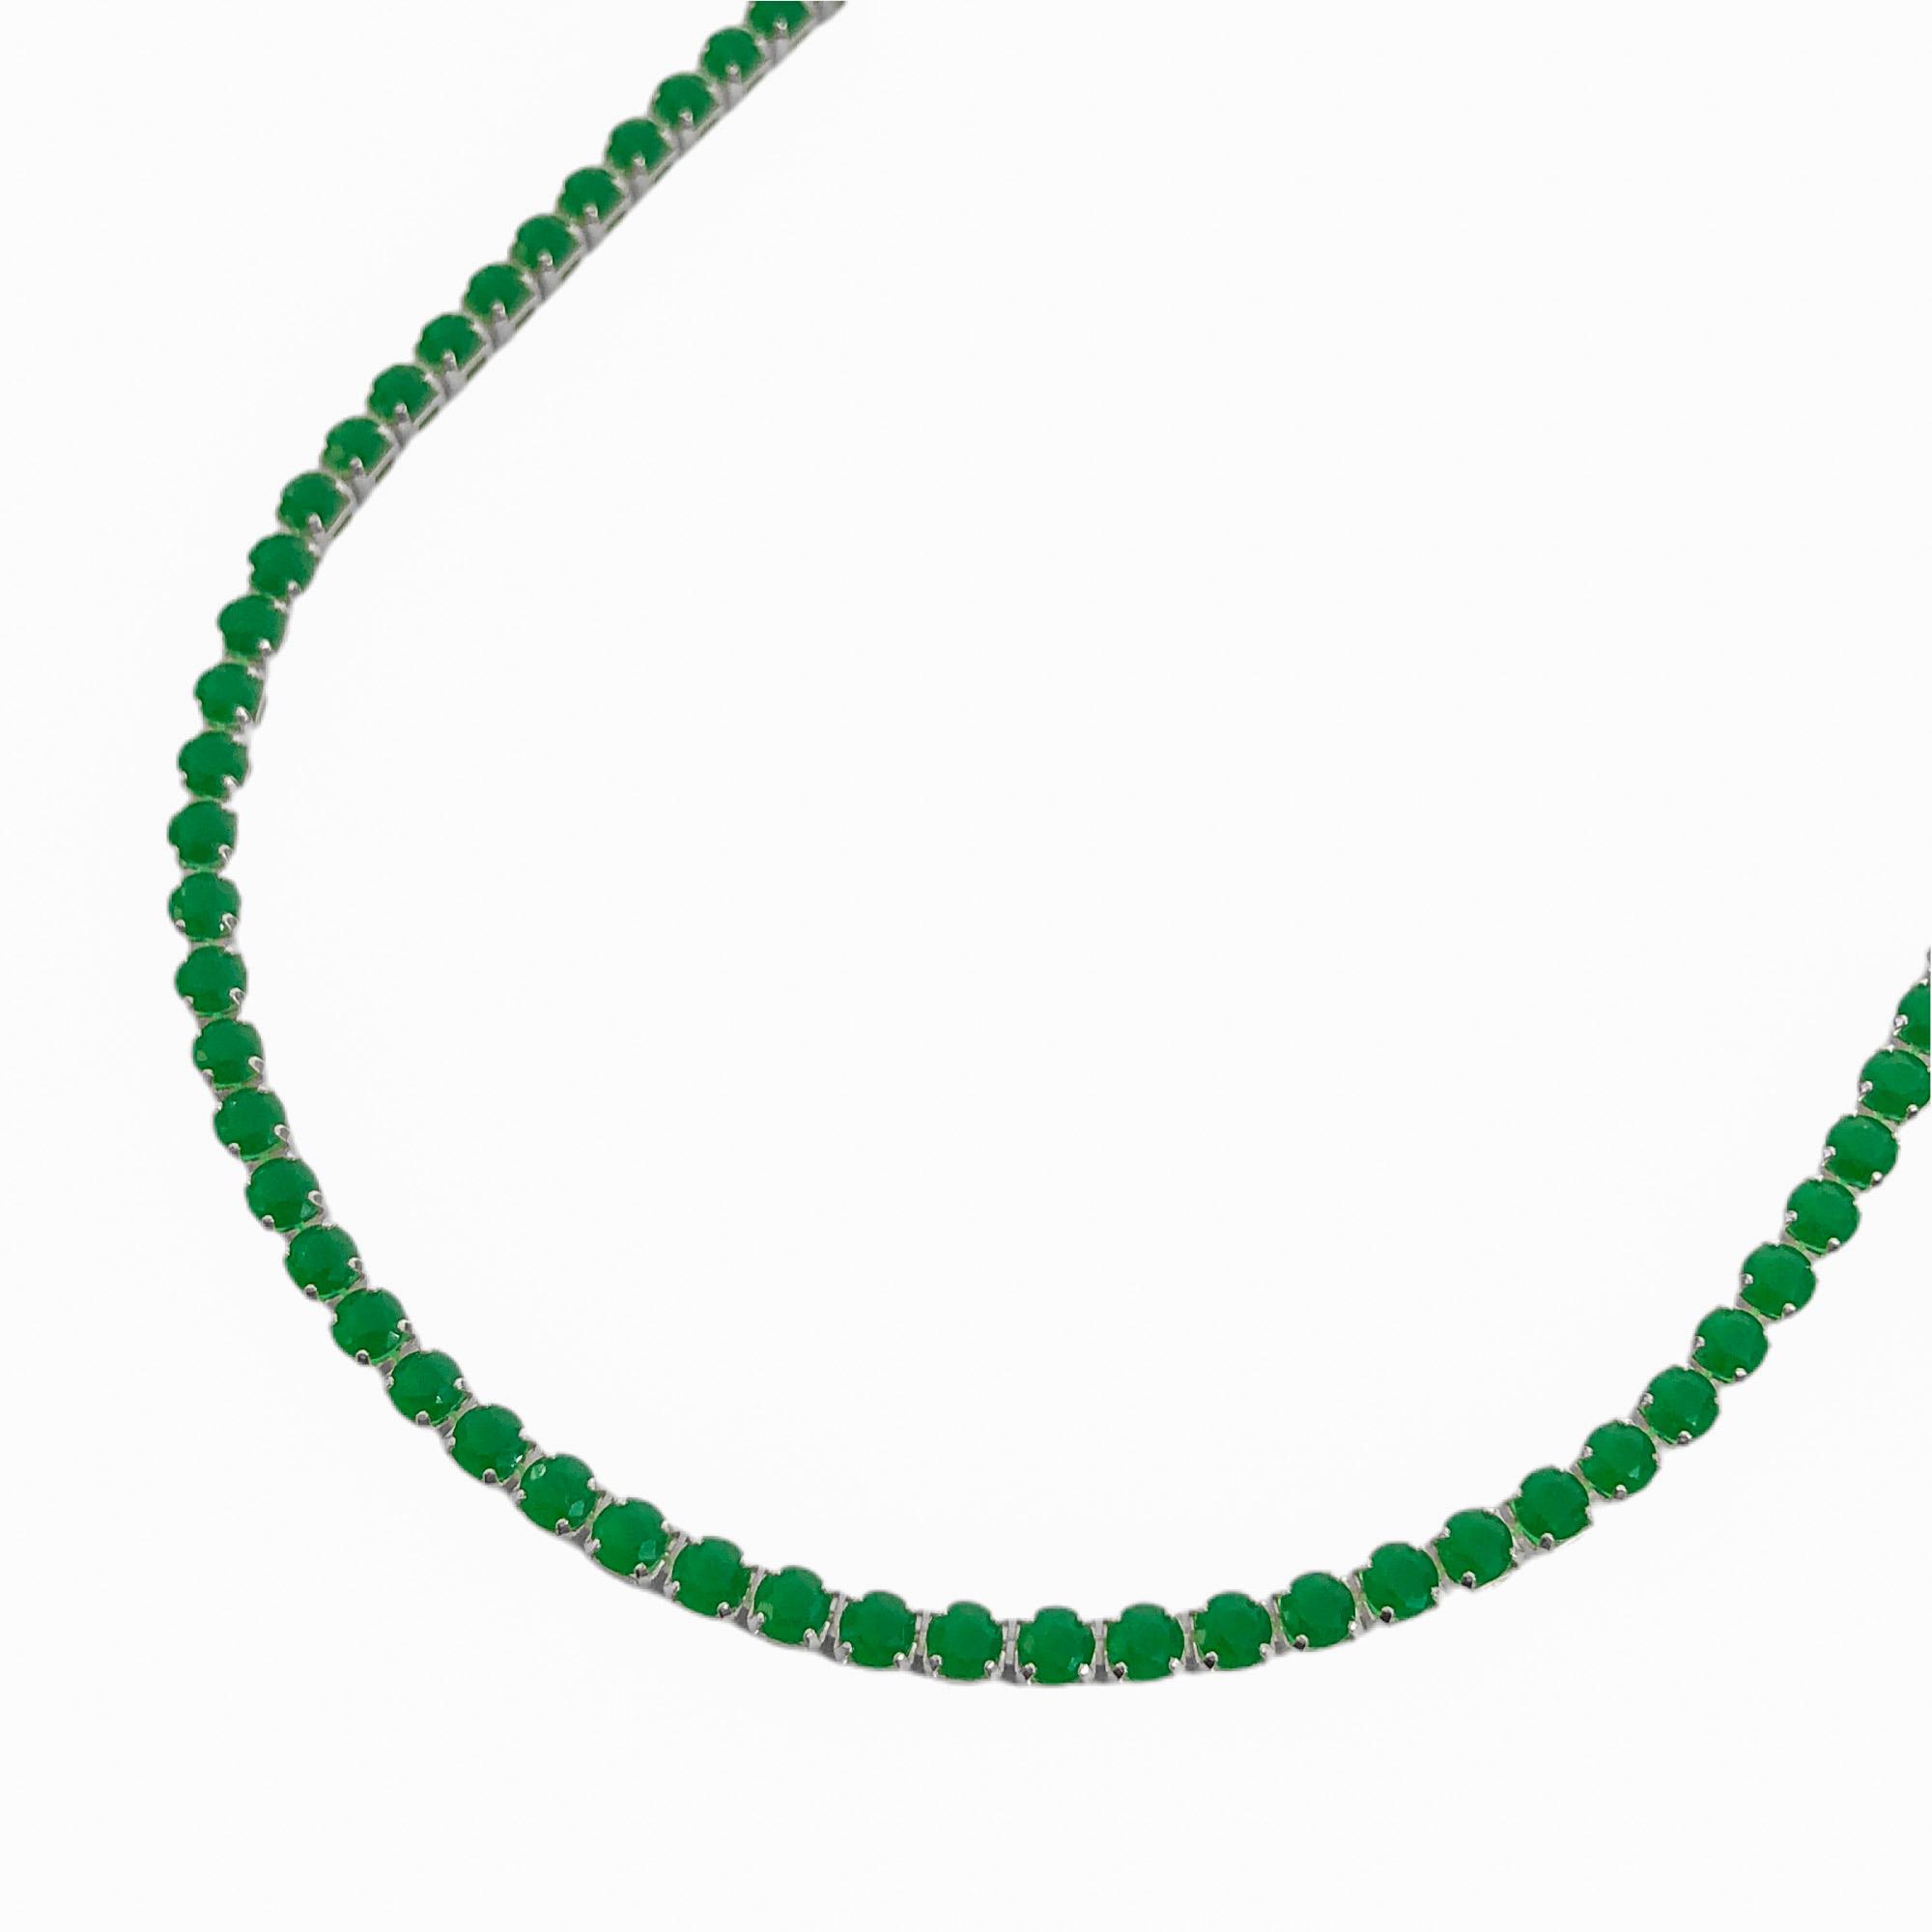 Colar Riviera Tennis Chain 3mm 45cm (9,6g) (Pedra Zircônia Verde) (Banho Prata 925)